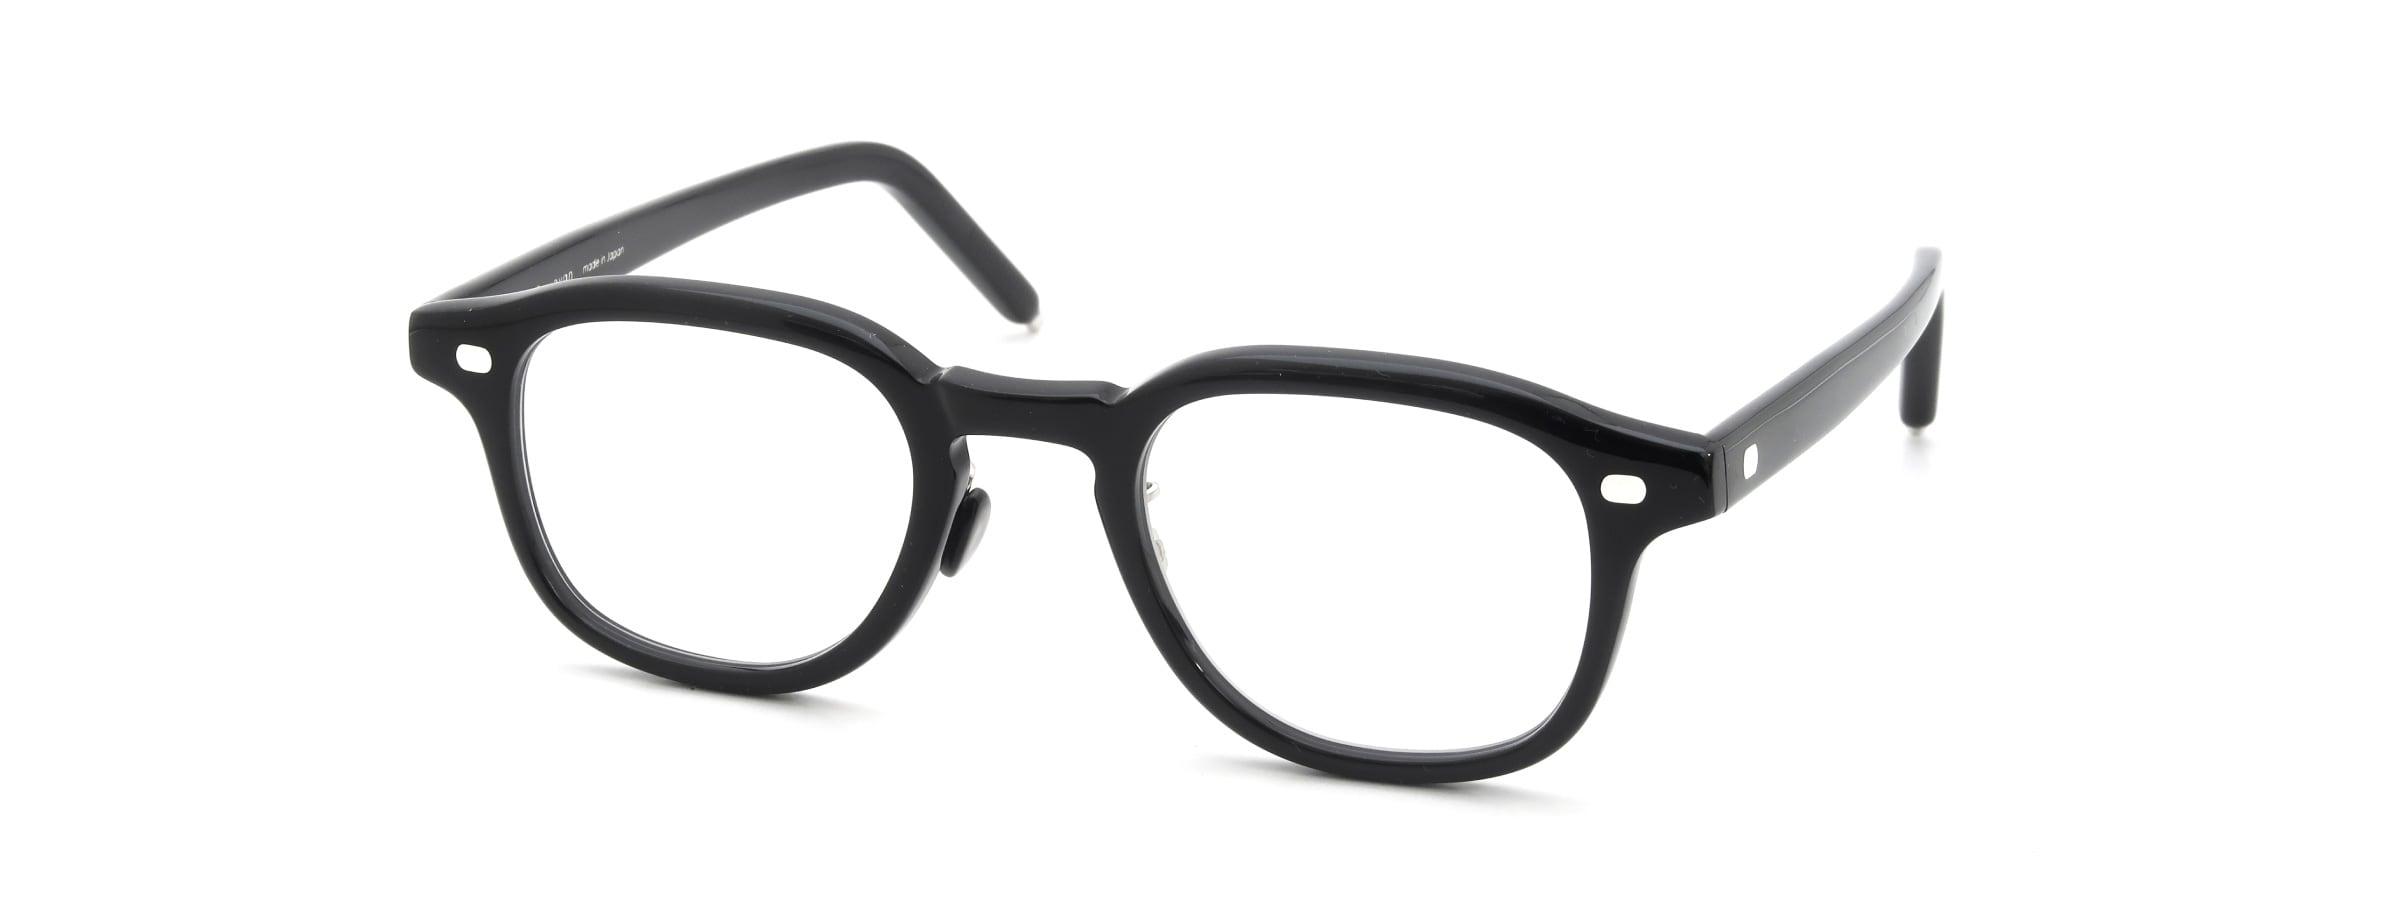 10 eyevan NO.7 Ⅲ FR 47size